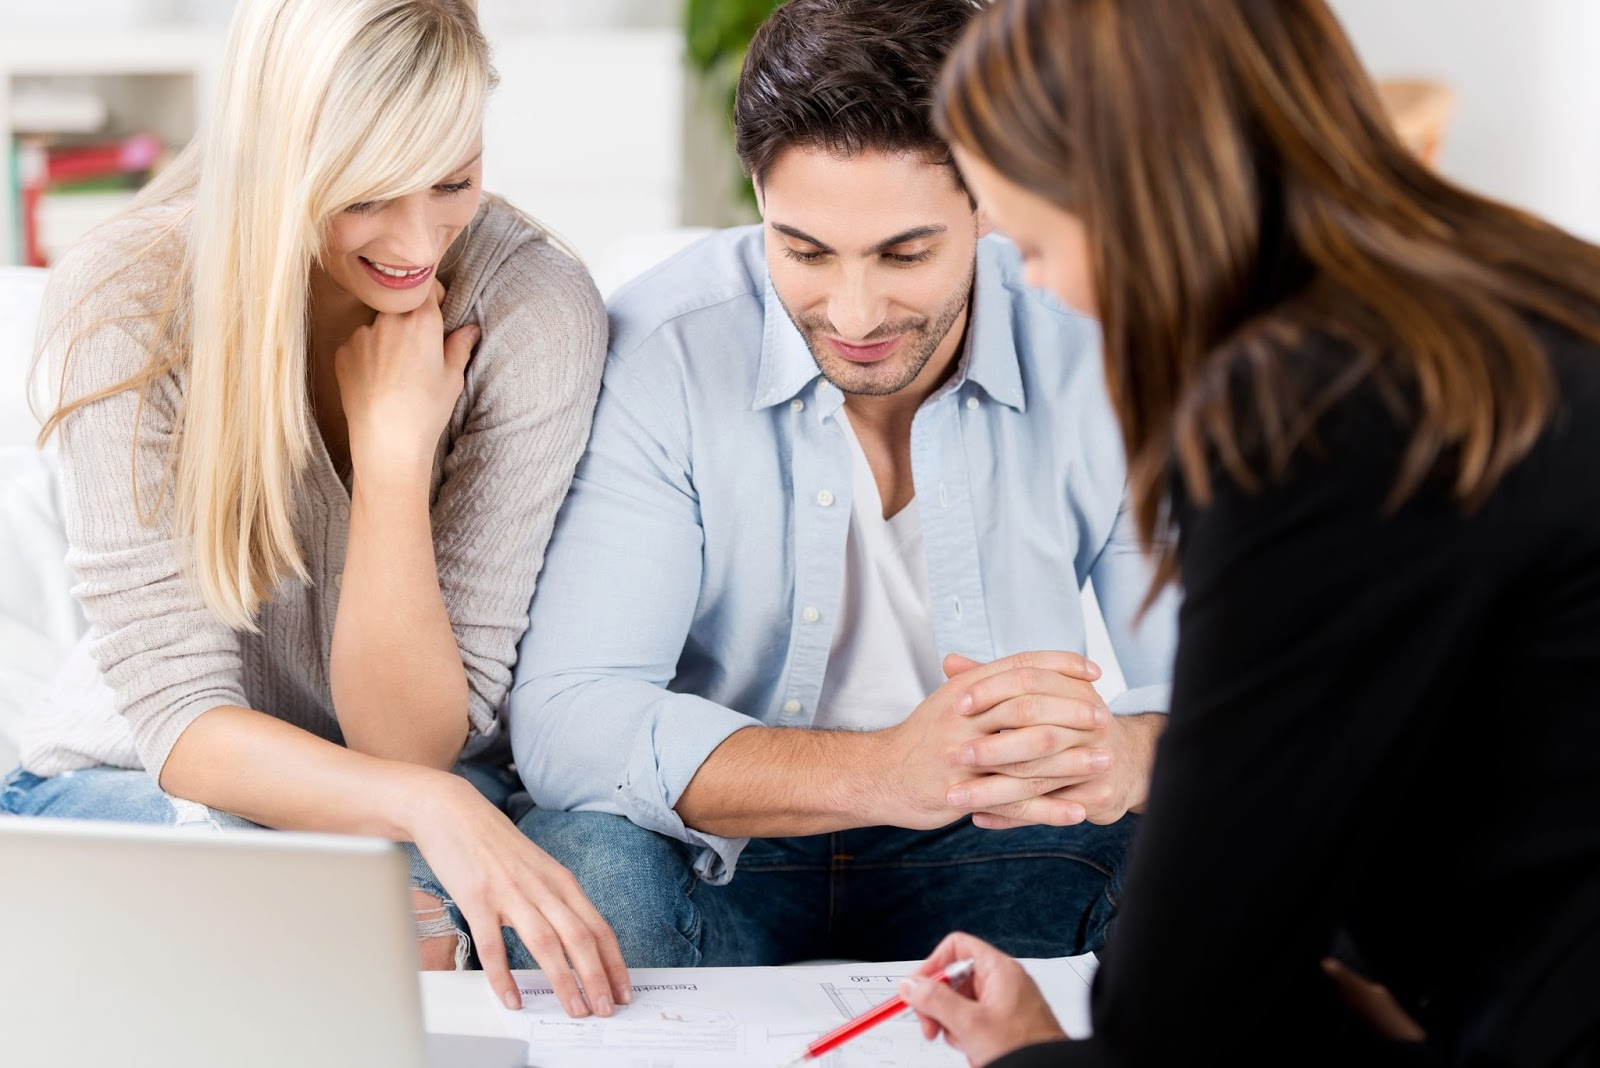 payday loans Crossville TN